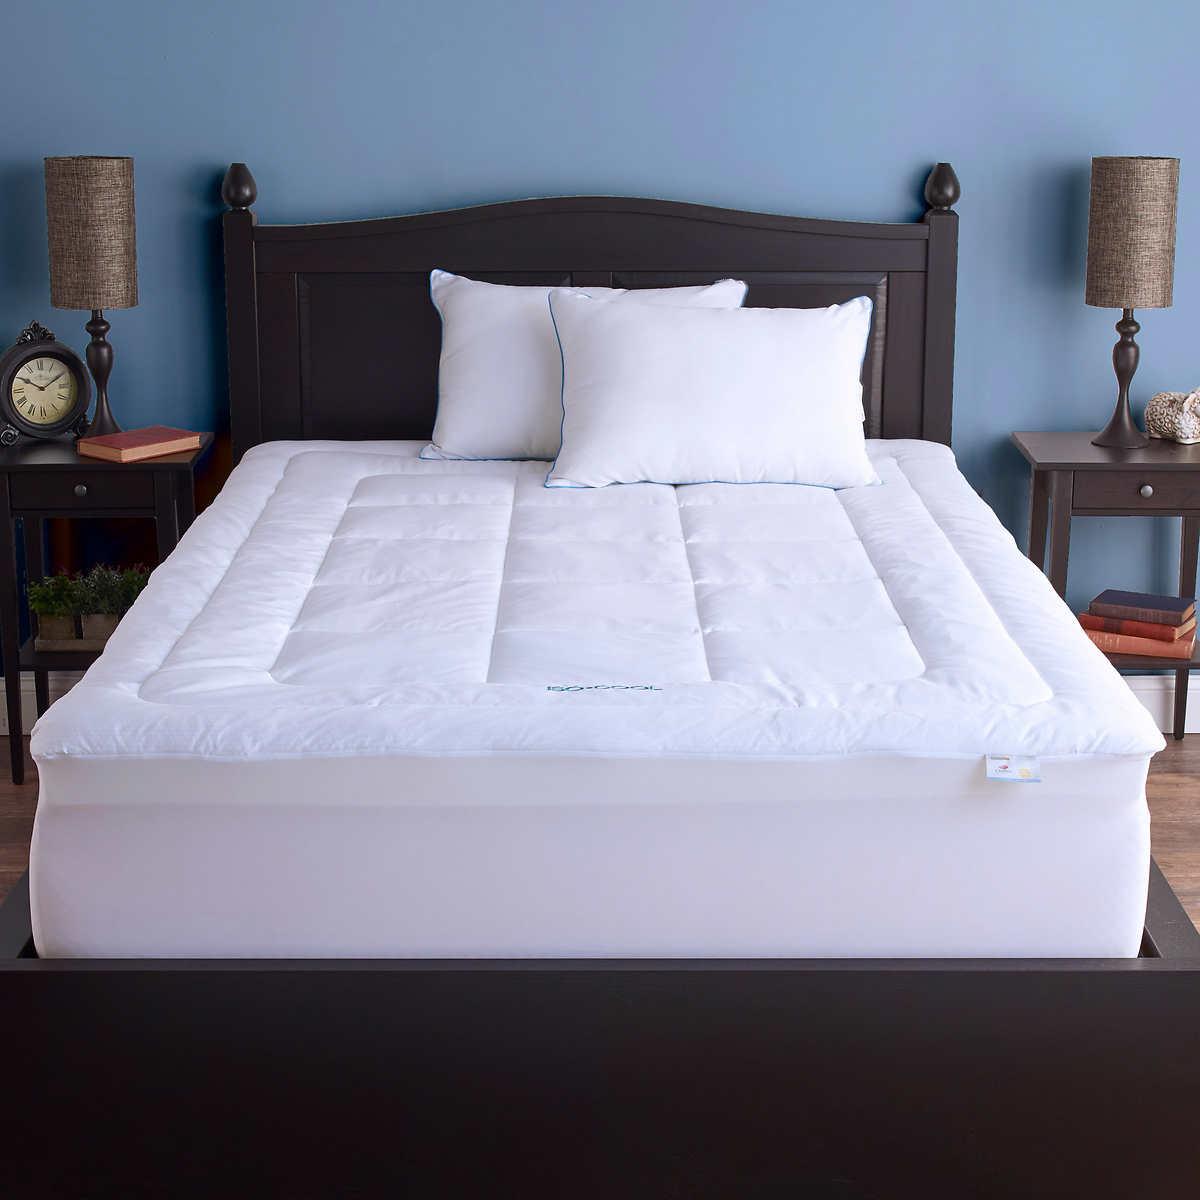 SleepBetter Iso-Cool Memory Foam Mattress Topper